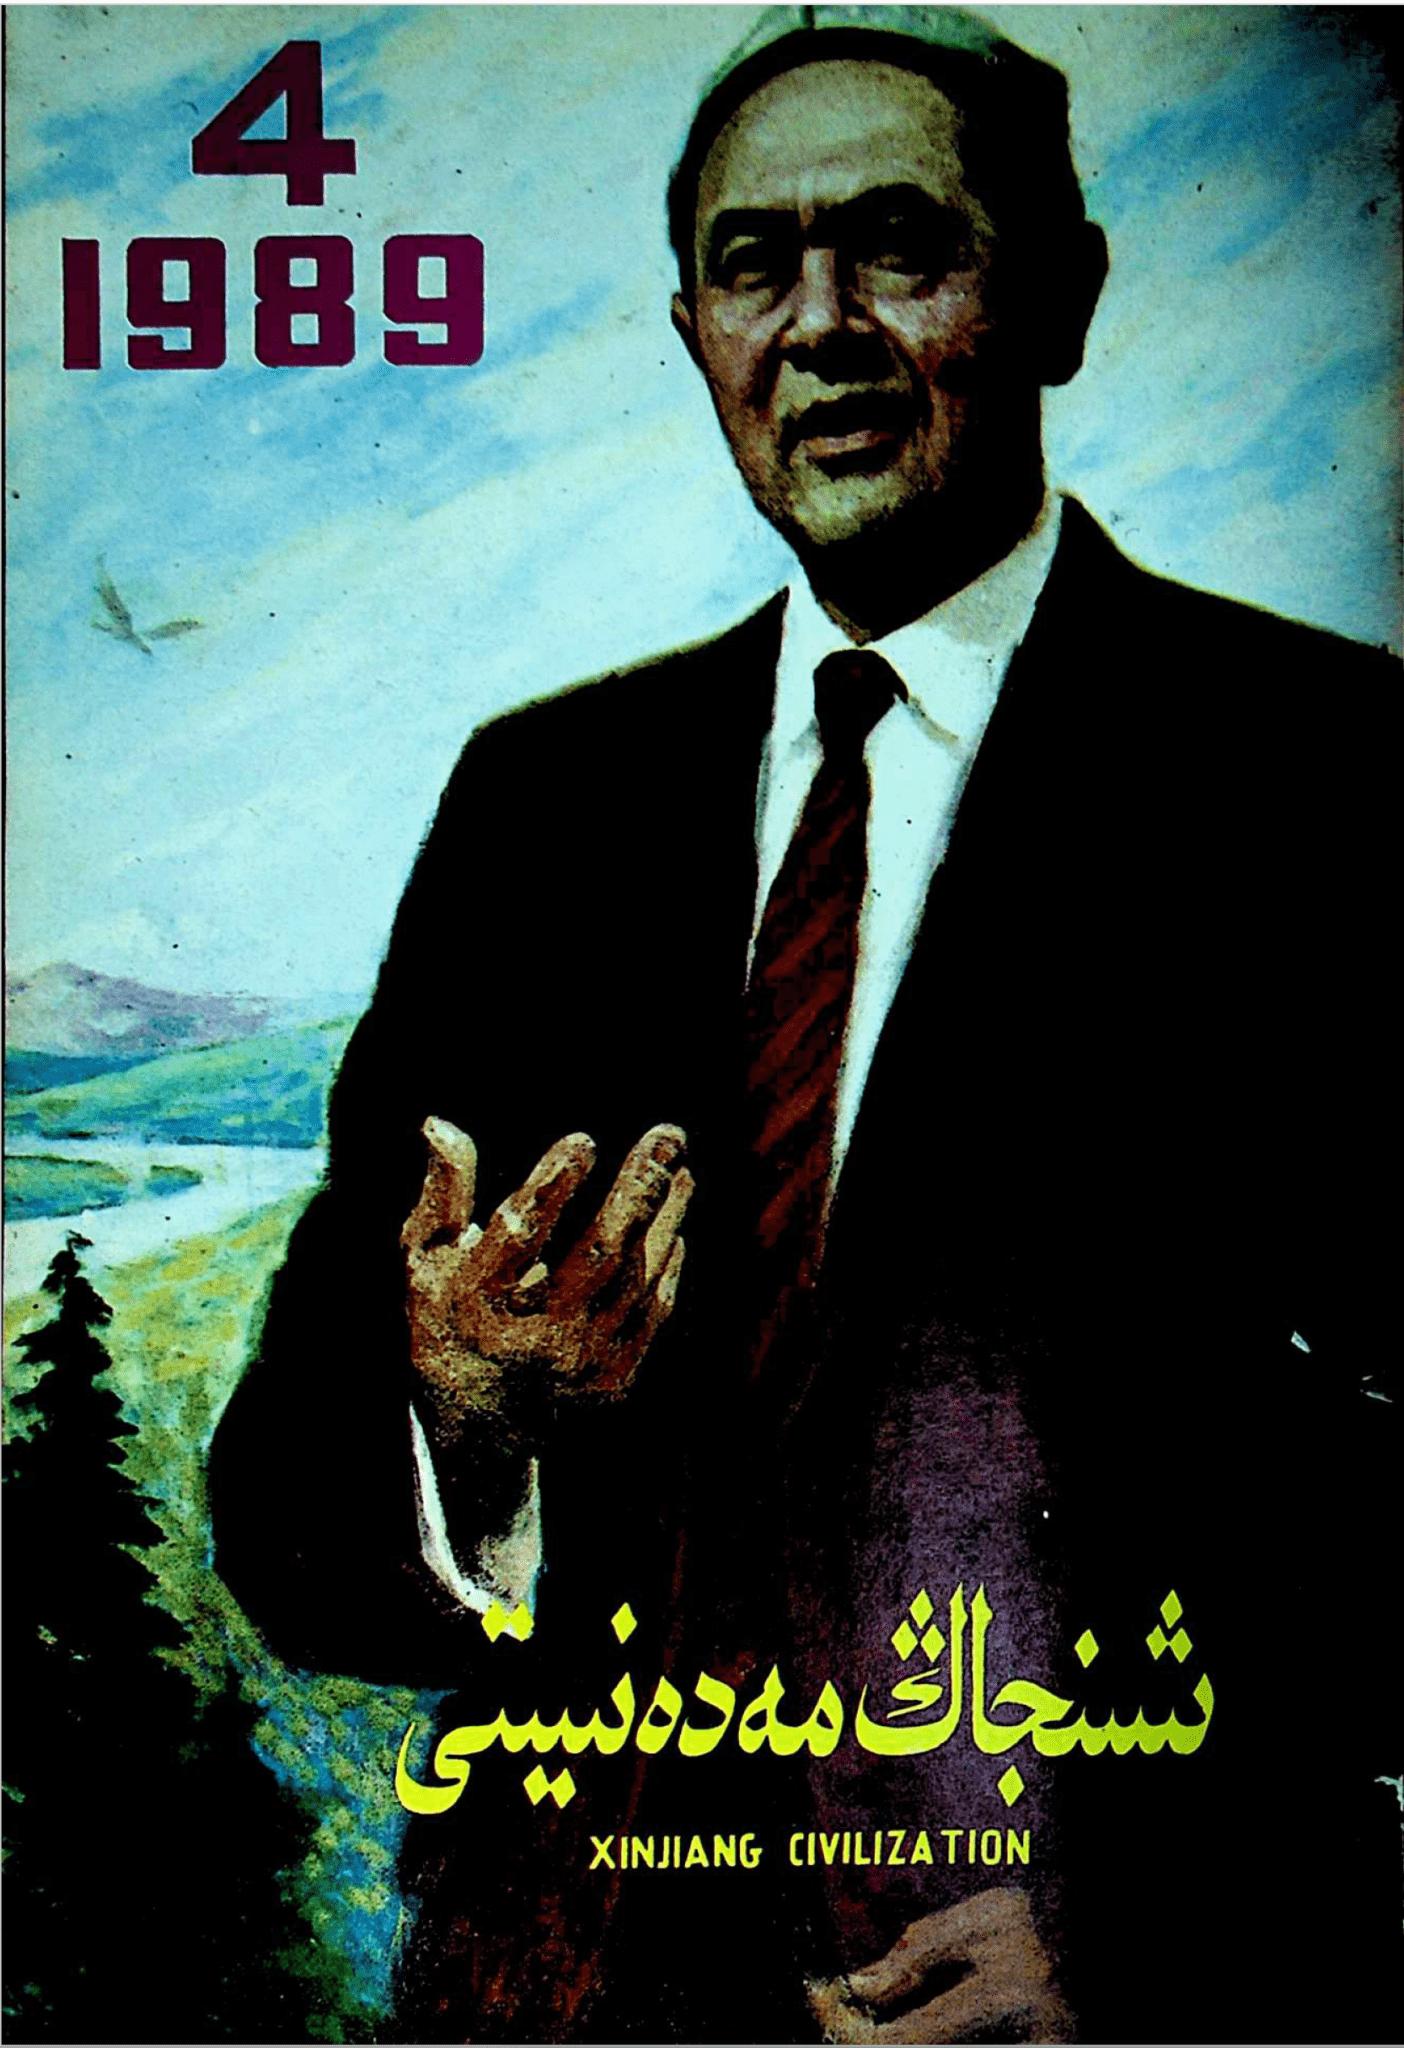 Screenshot 2020 03 05 at 15.29.49 - شىنجاڭ مەدەنىيىتى 1989-يىلى 4-سان